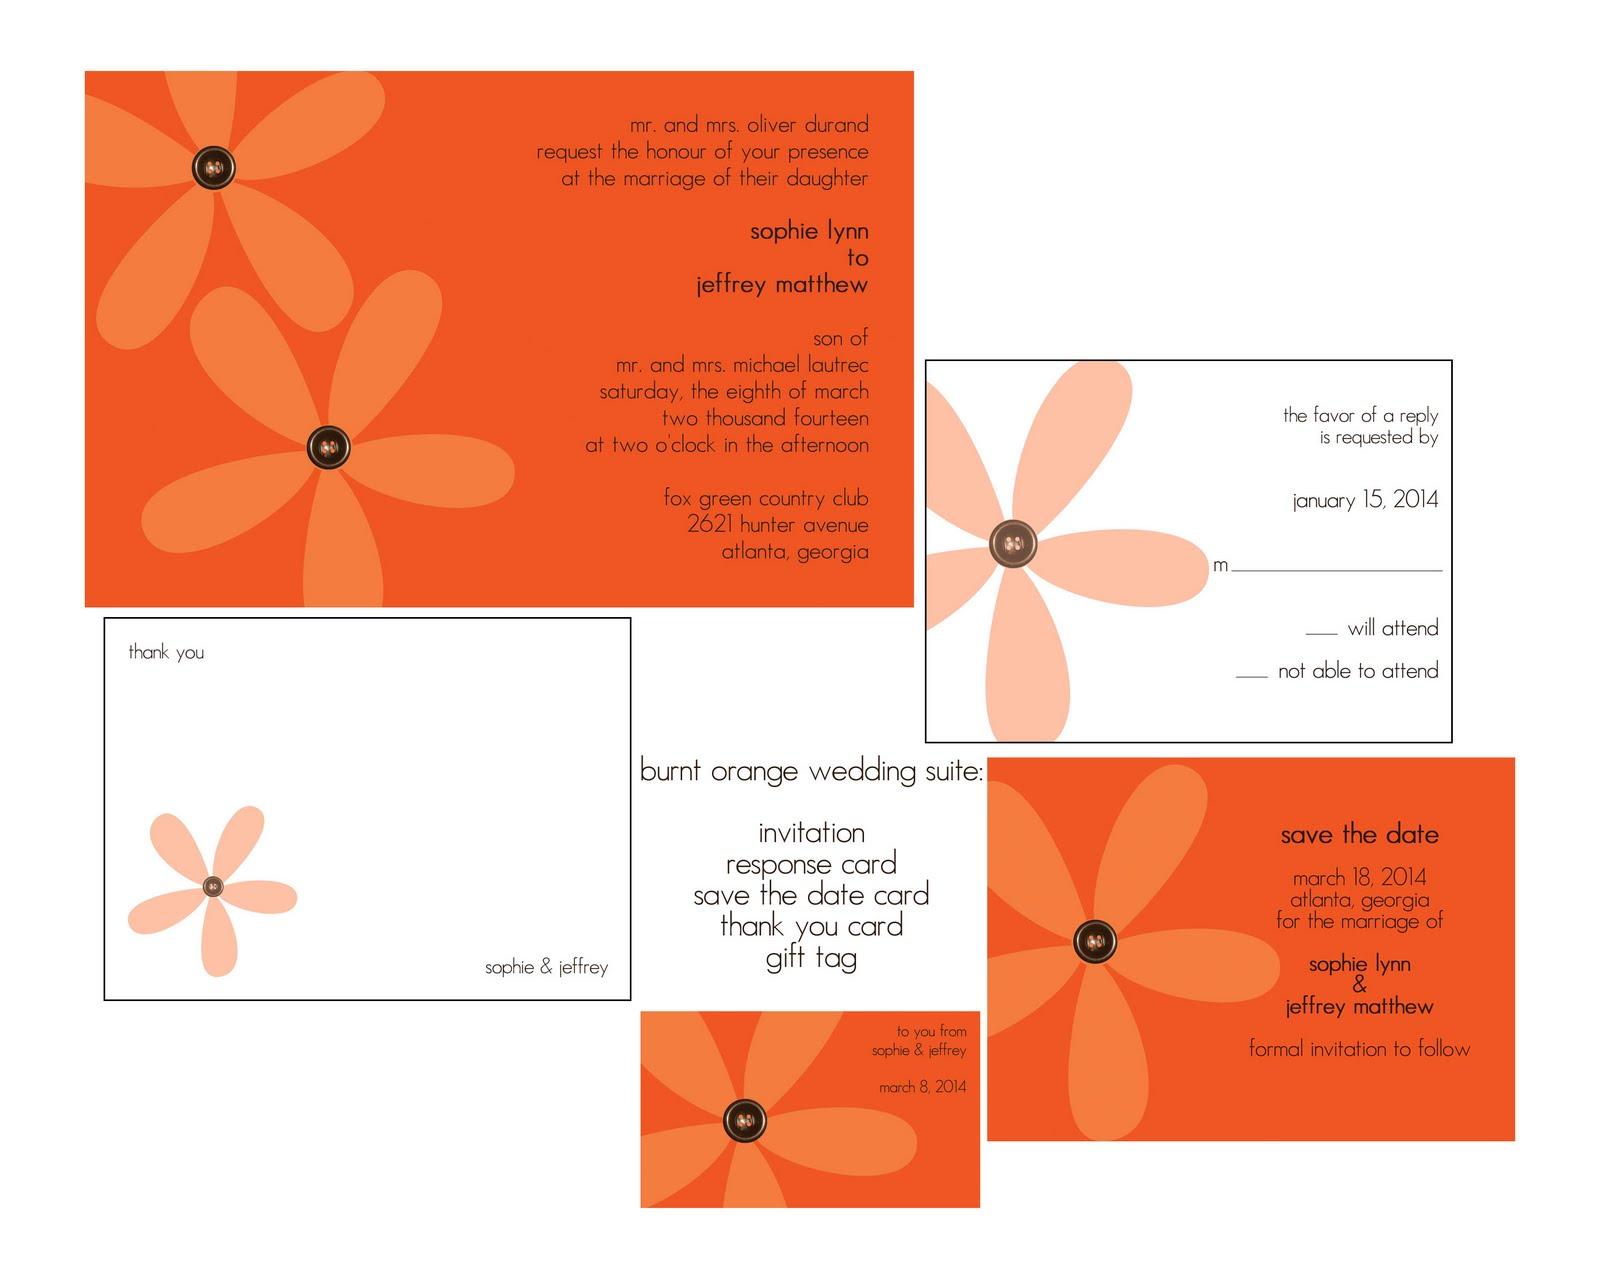 Orange And Green Wedding Invitations: Maryhelen's Blog: Purple And Lime Green Wedding